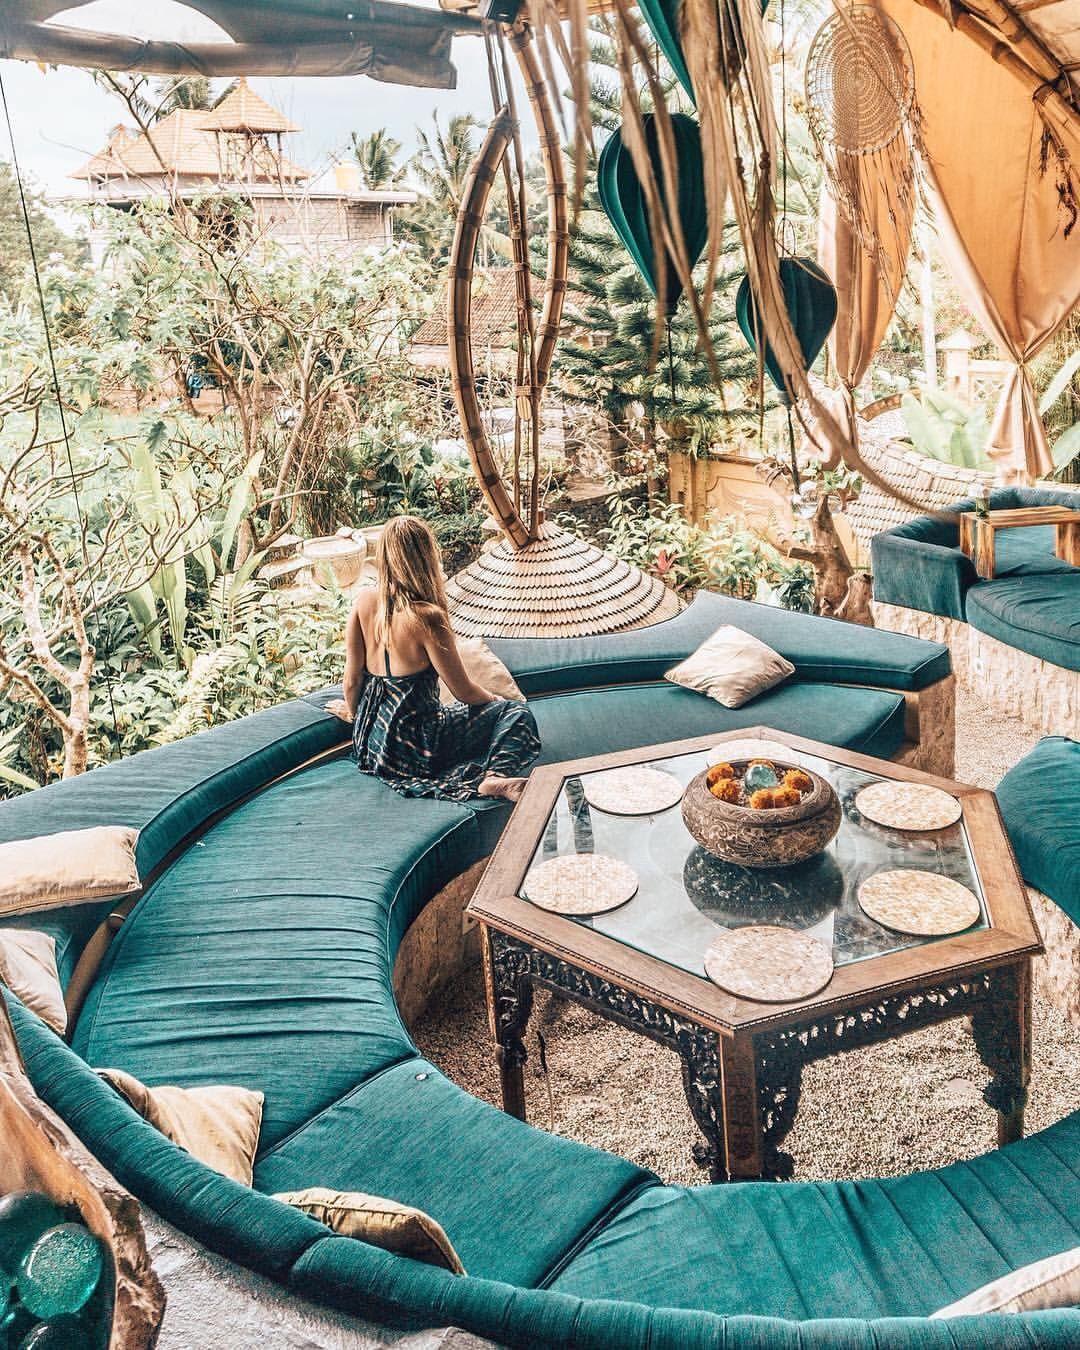 Bali Trip Explore Bali Beyond Sur Instagram One Of The Best